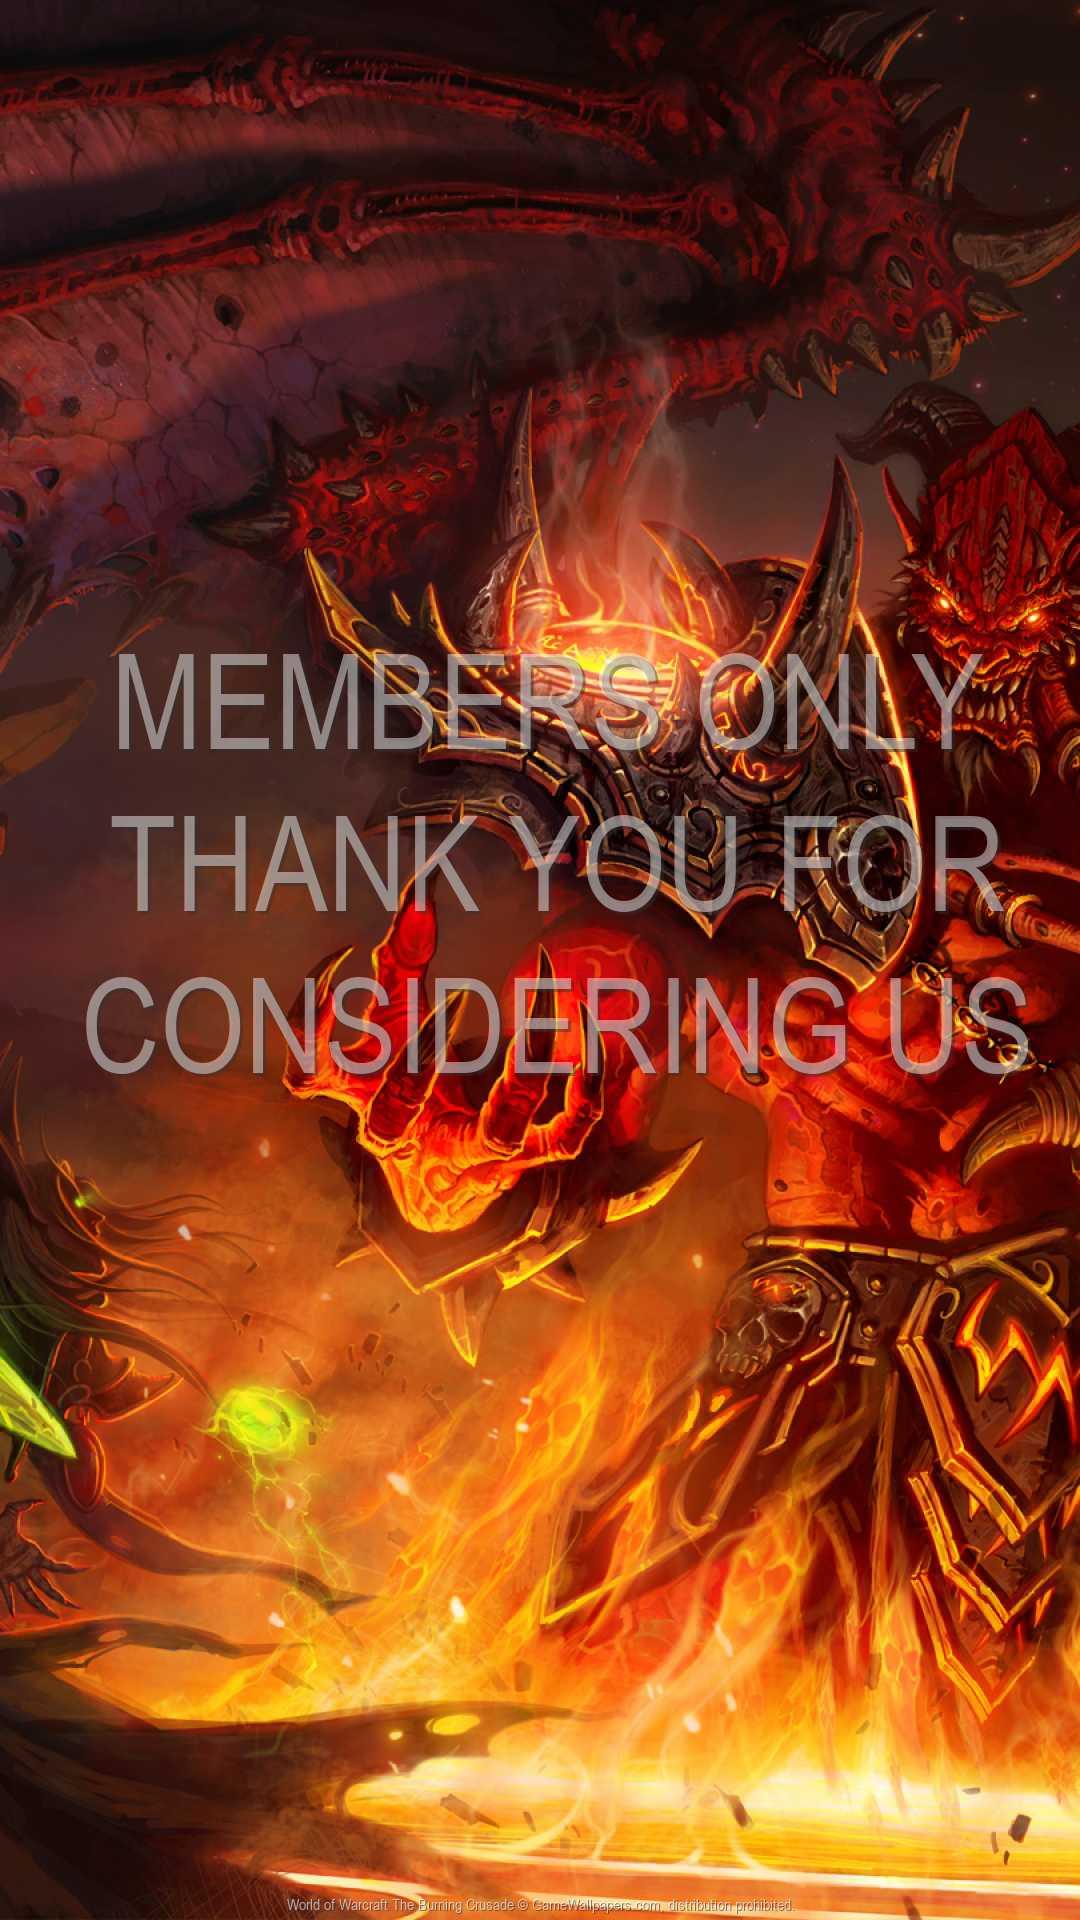 World of Warcraft: The Burning Crusade 1080p Vertical Handy Hintergrundbild 11